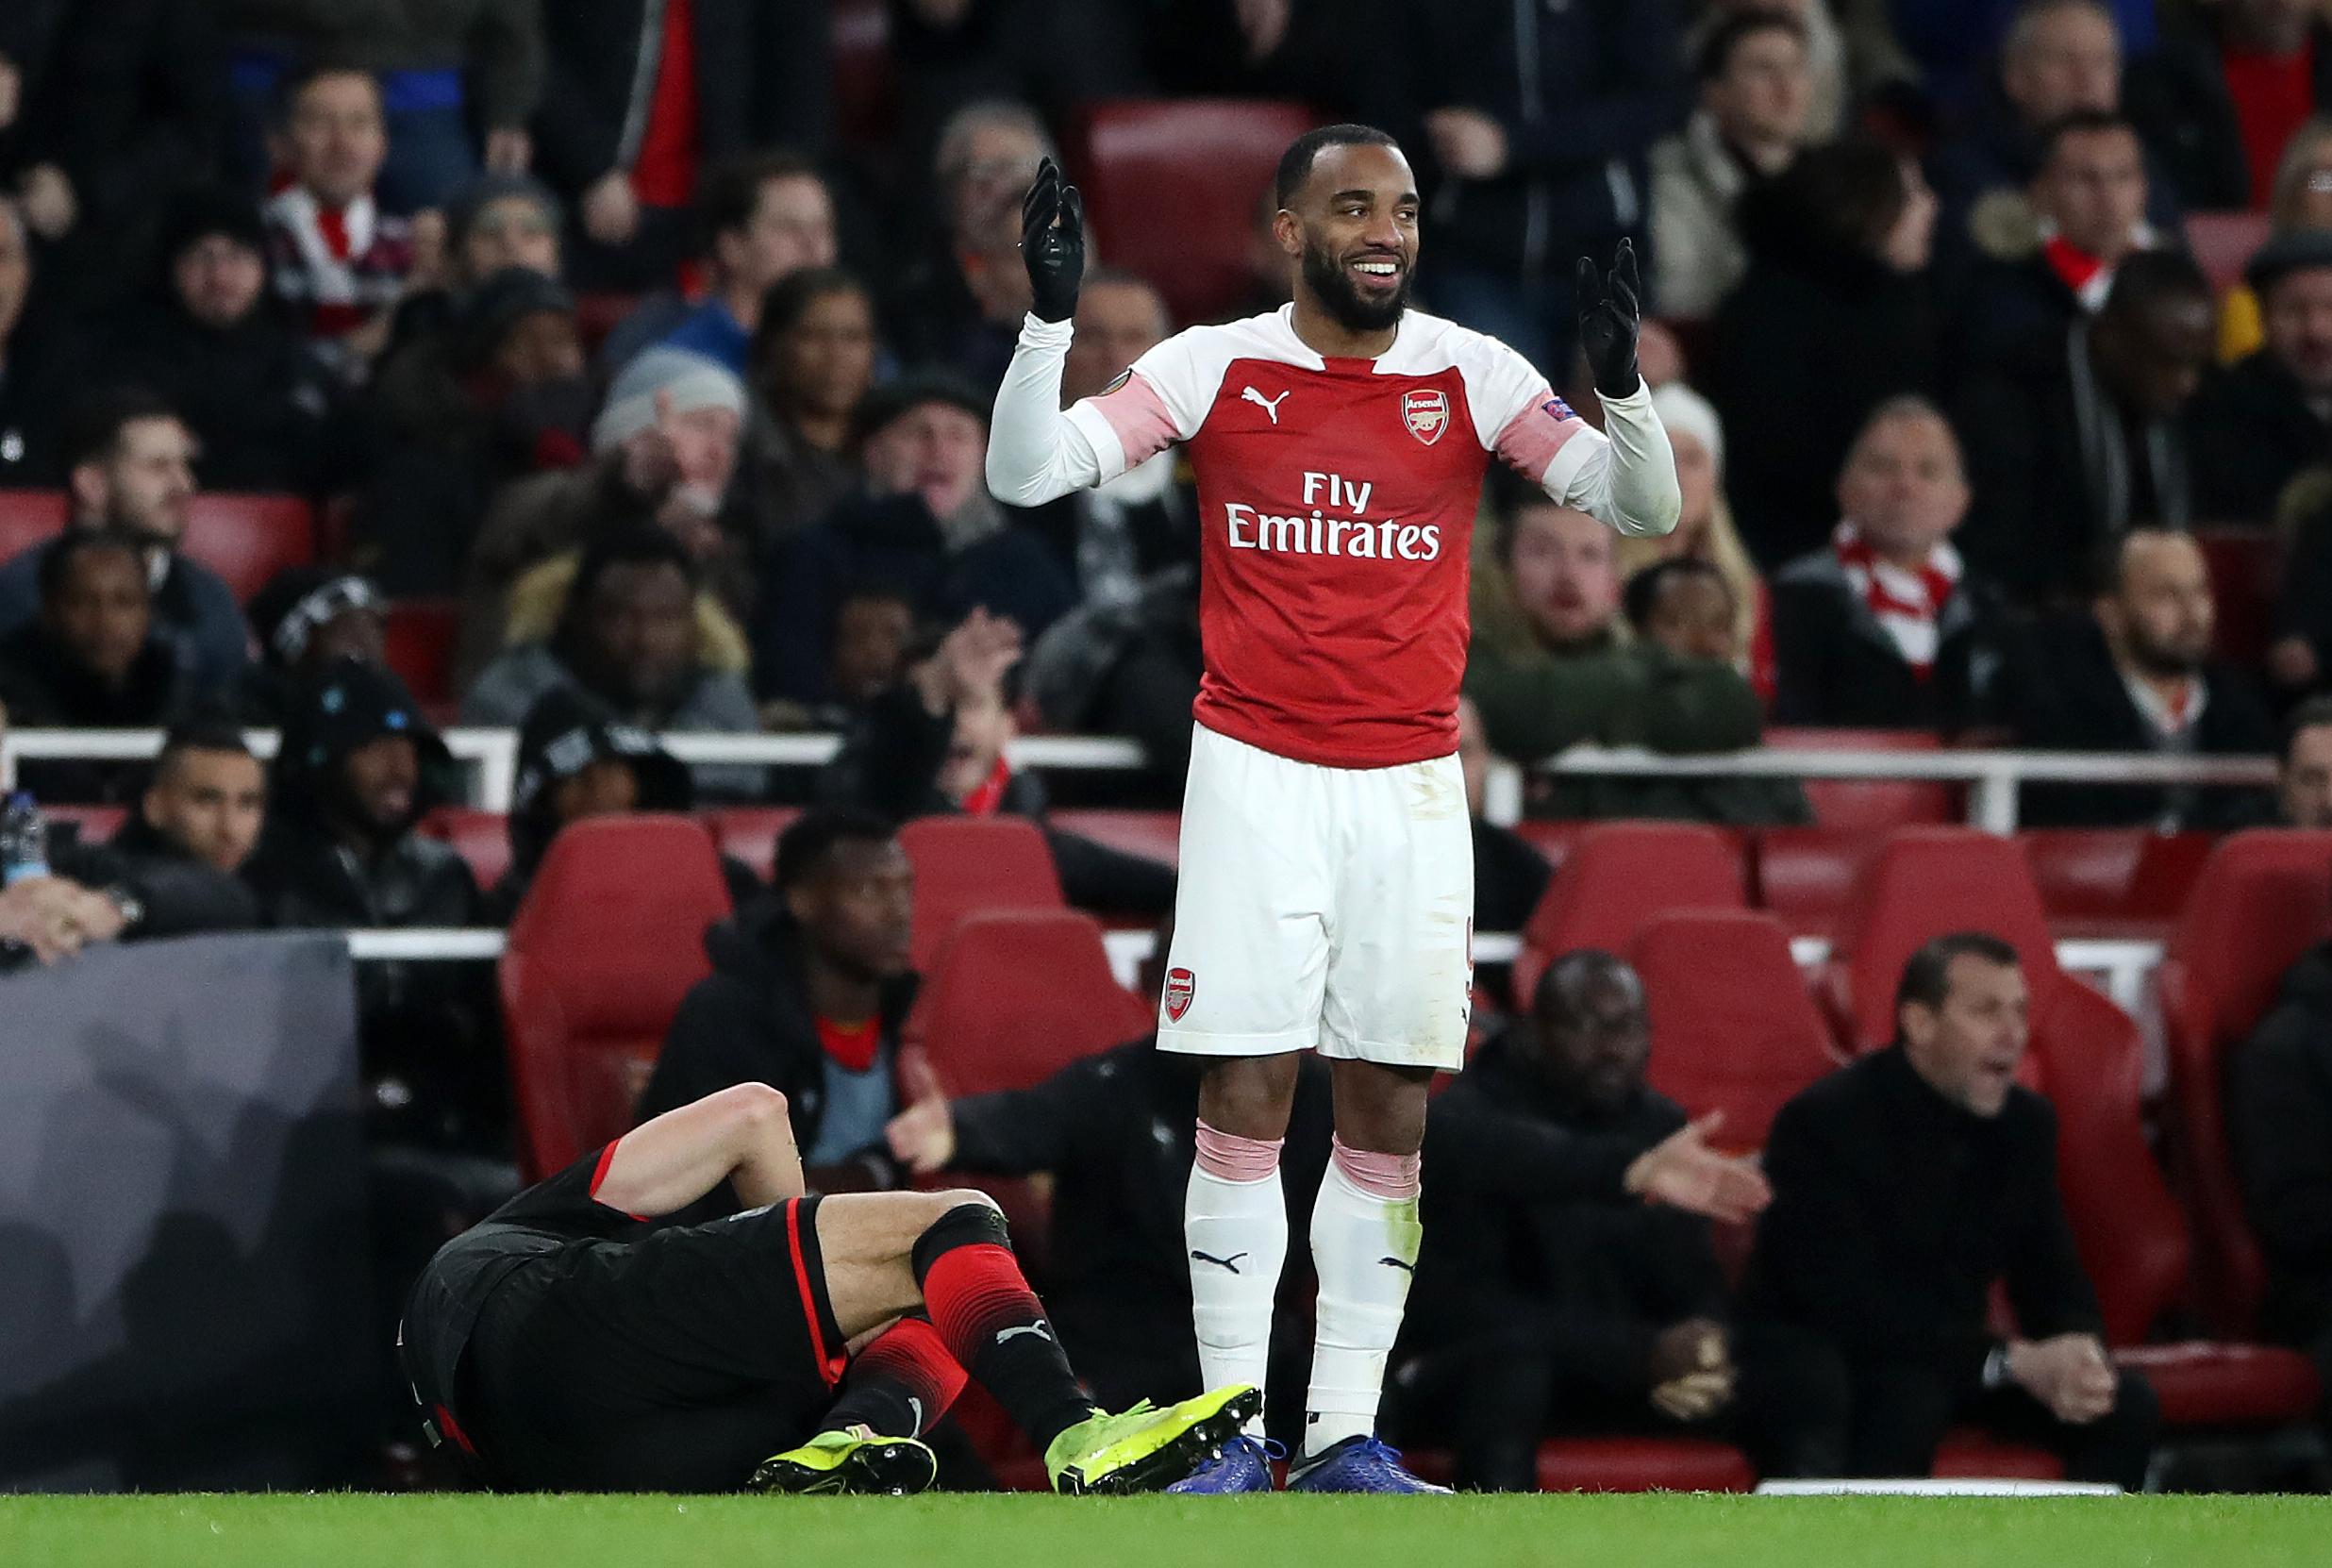 'It represents me': Arsenal's Pierre-Emerick Aubameyang explains Black Panther mask